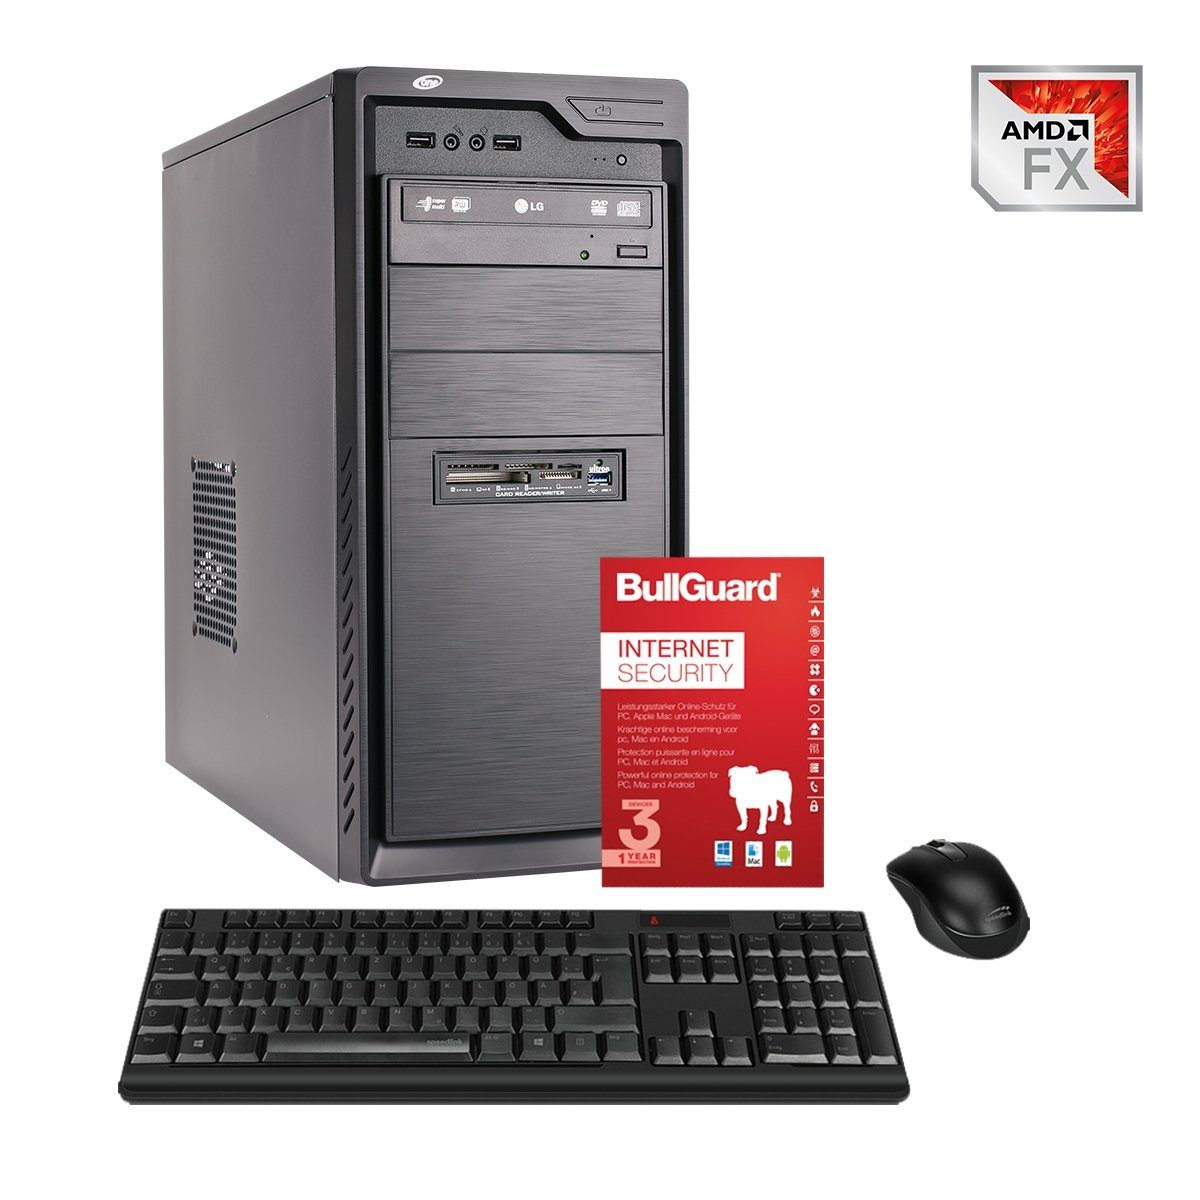 ONE PC, FX-4300, Radeon HD 3000, 4GB DDR3 SDRAM »Office PC 44017«